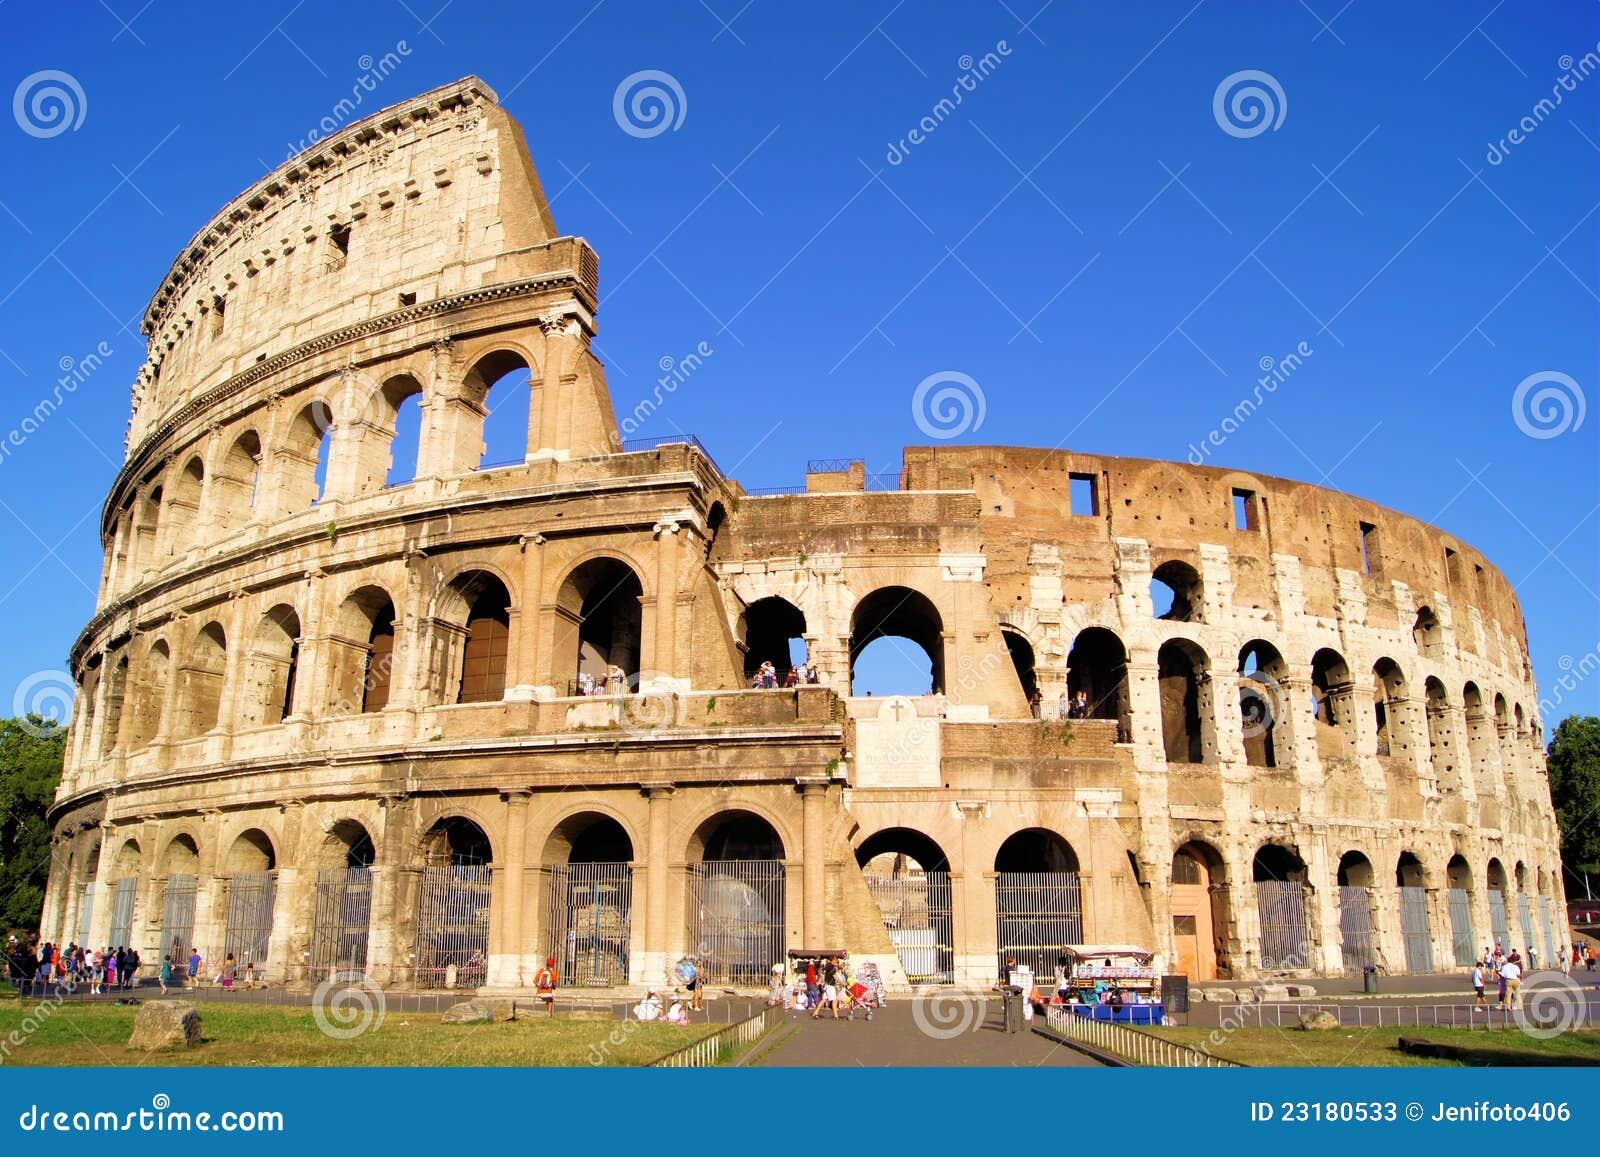 El Colosseum de Roma